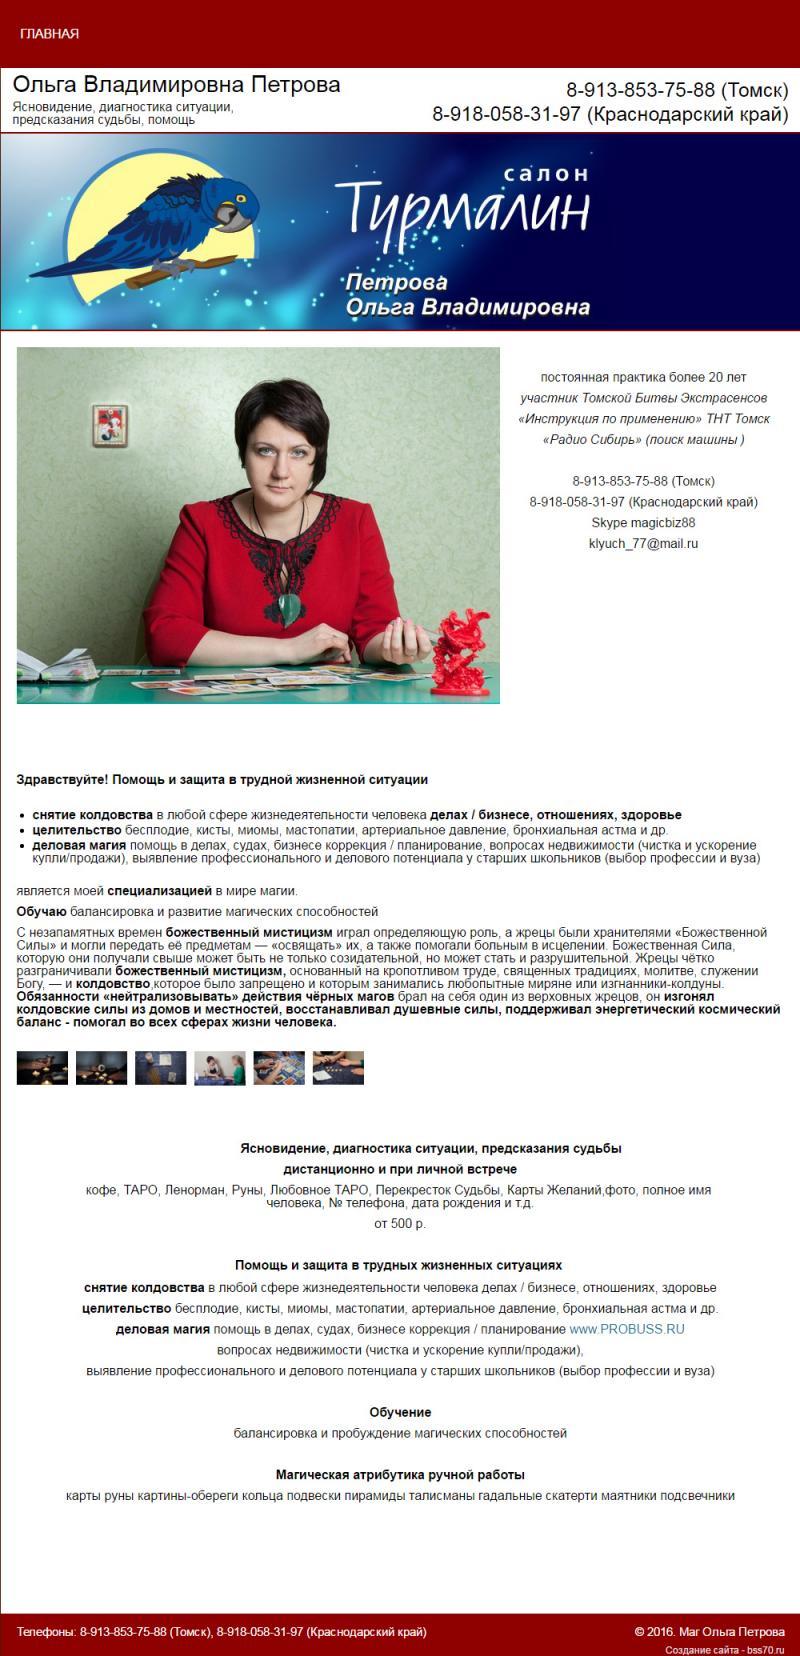 Ольга Владимировна Петрова (сайт)